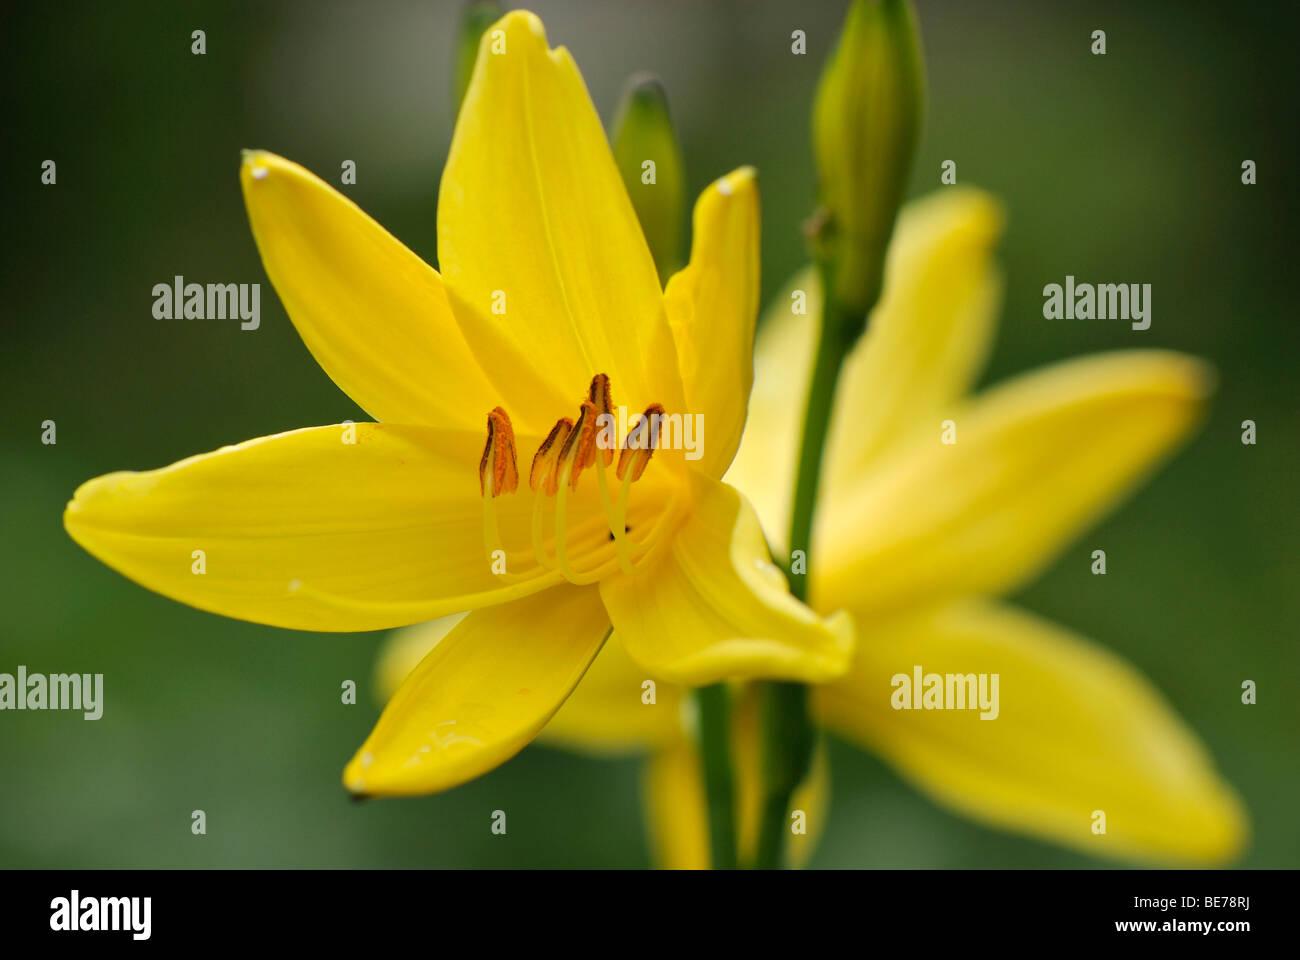 Día amarillo lirios (Hemerocallis), Fischbachau, Alta Baviera, Alemania, Europa Foto de stock